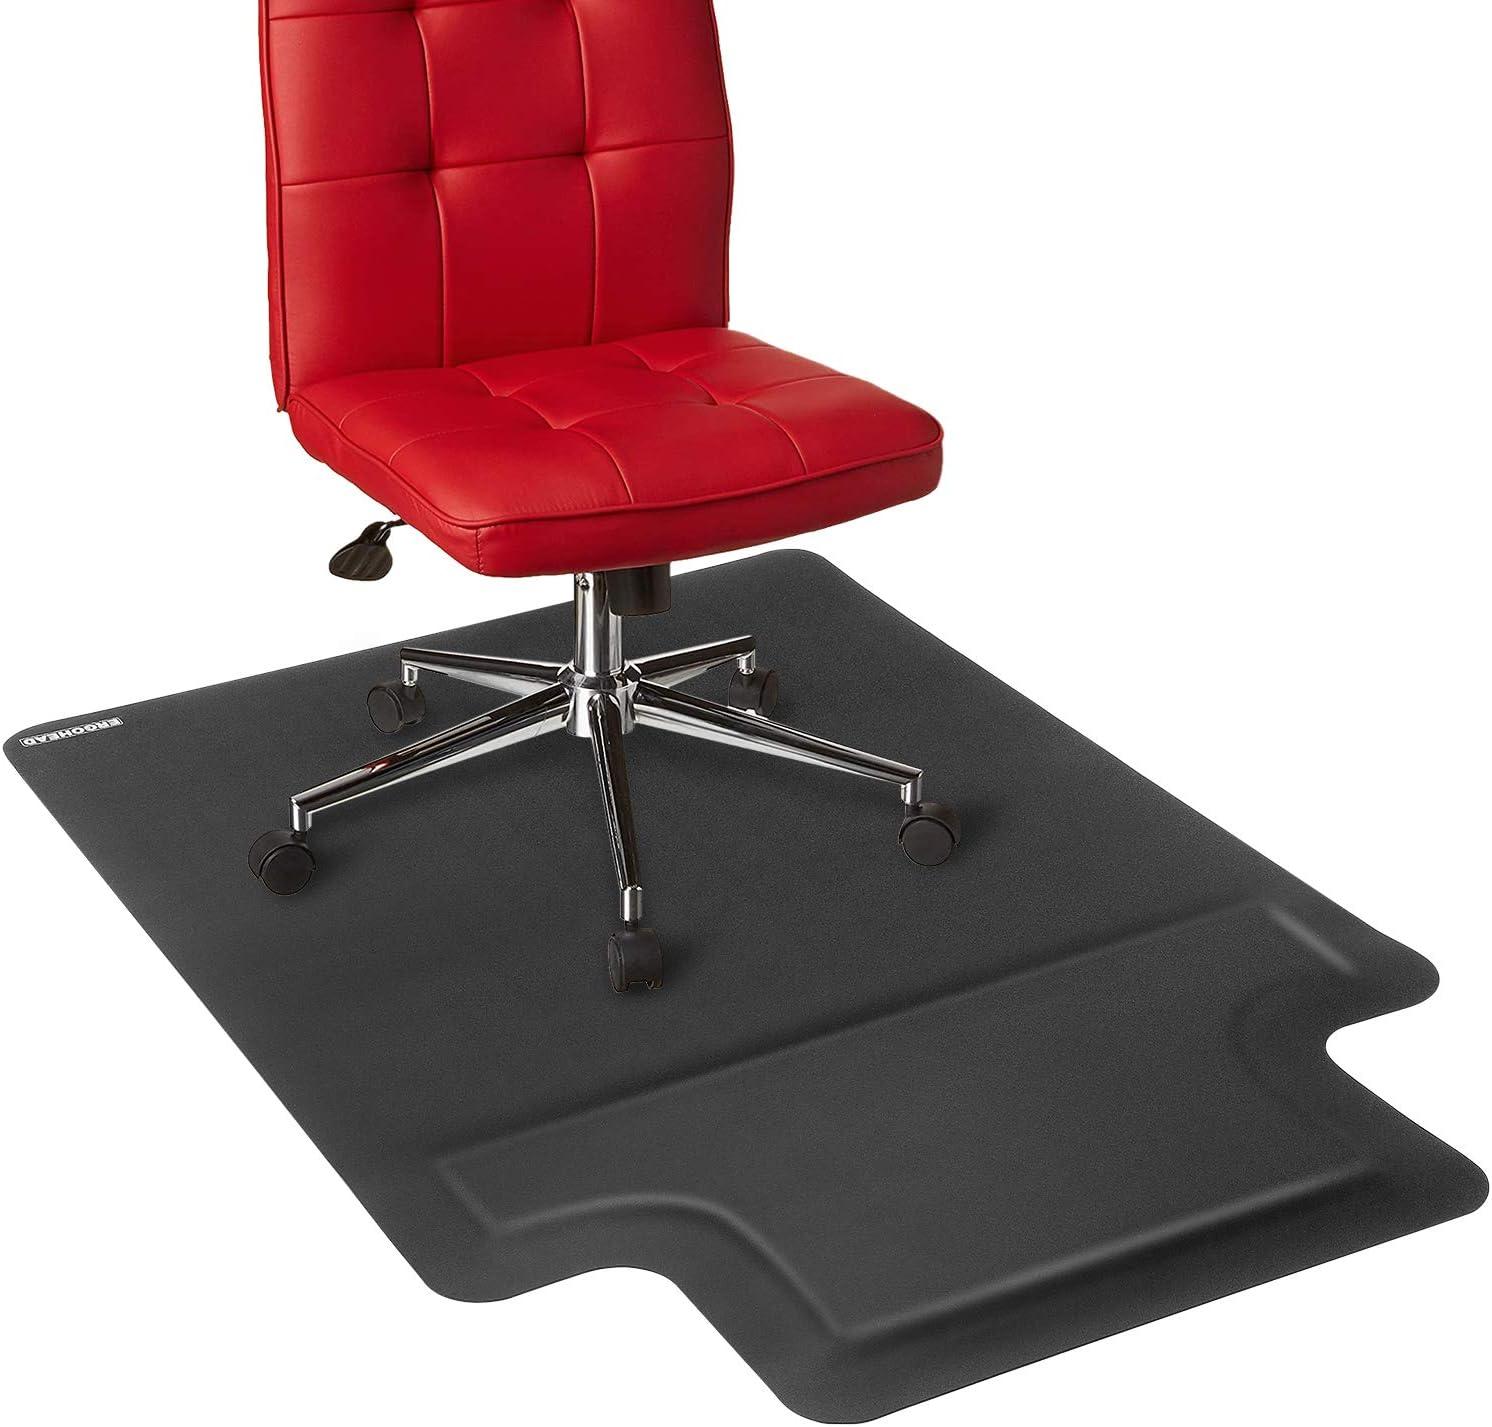 Ergohead Office Desk Chair Mat x Standing for Direct stock discount 54 Floor Max 44% OFF